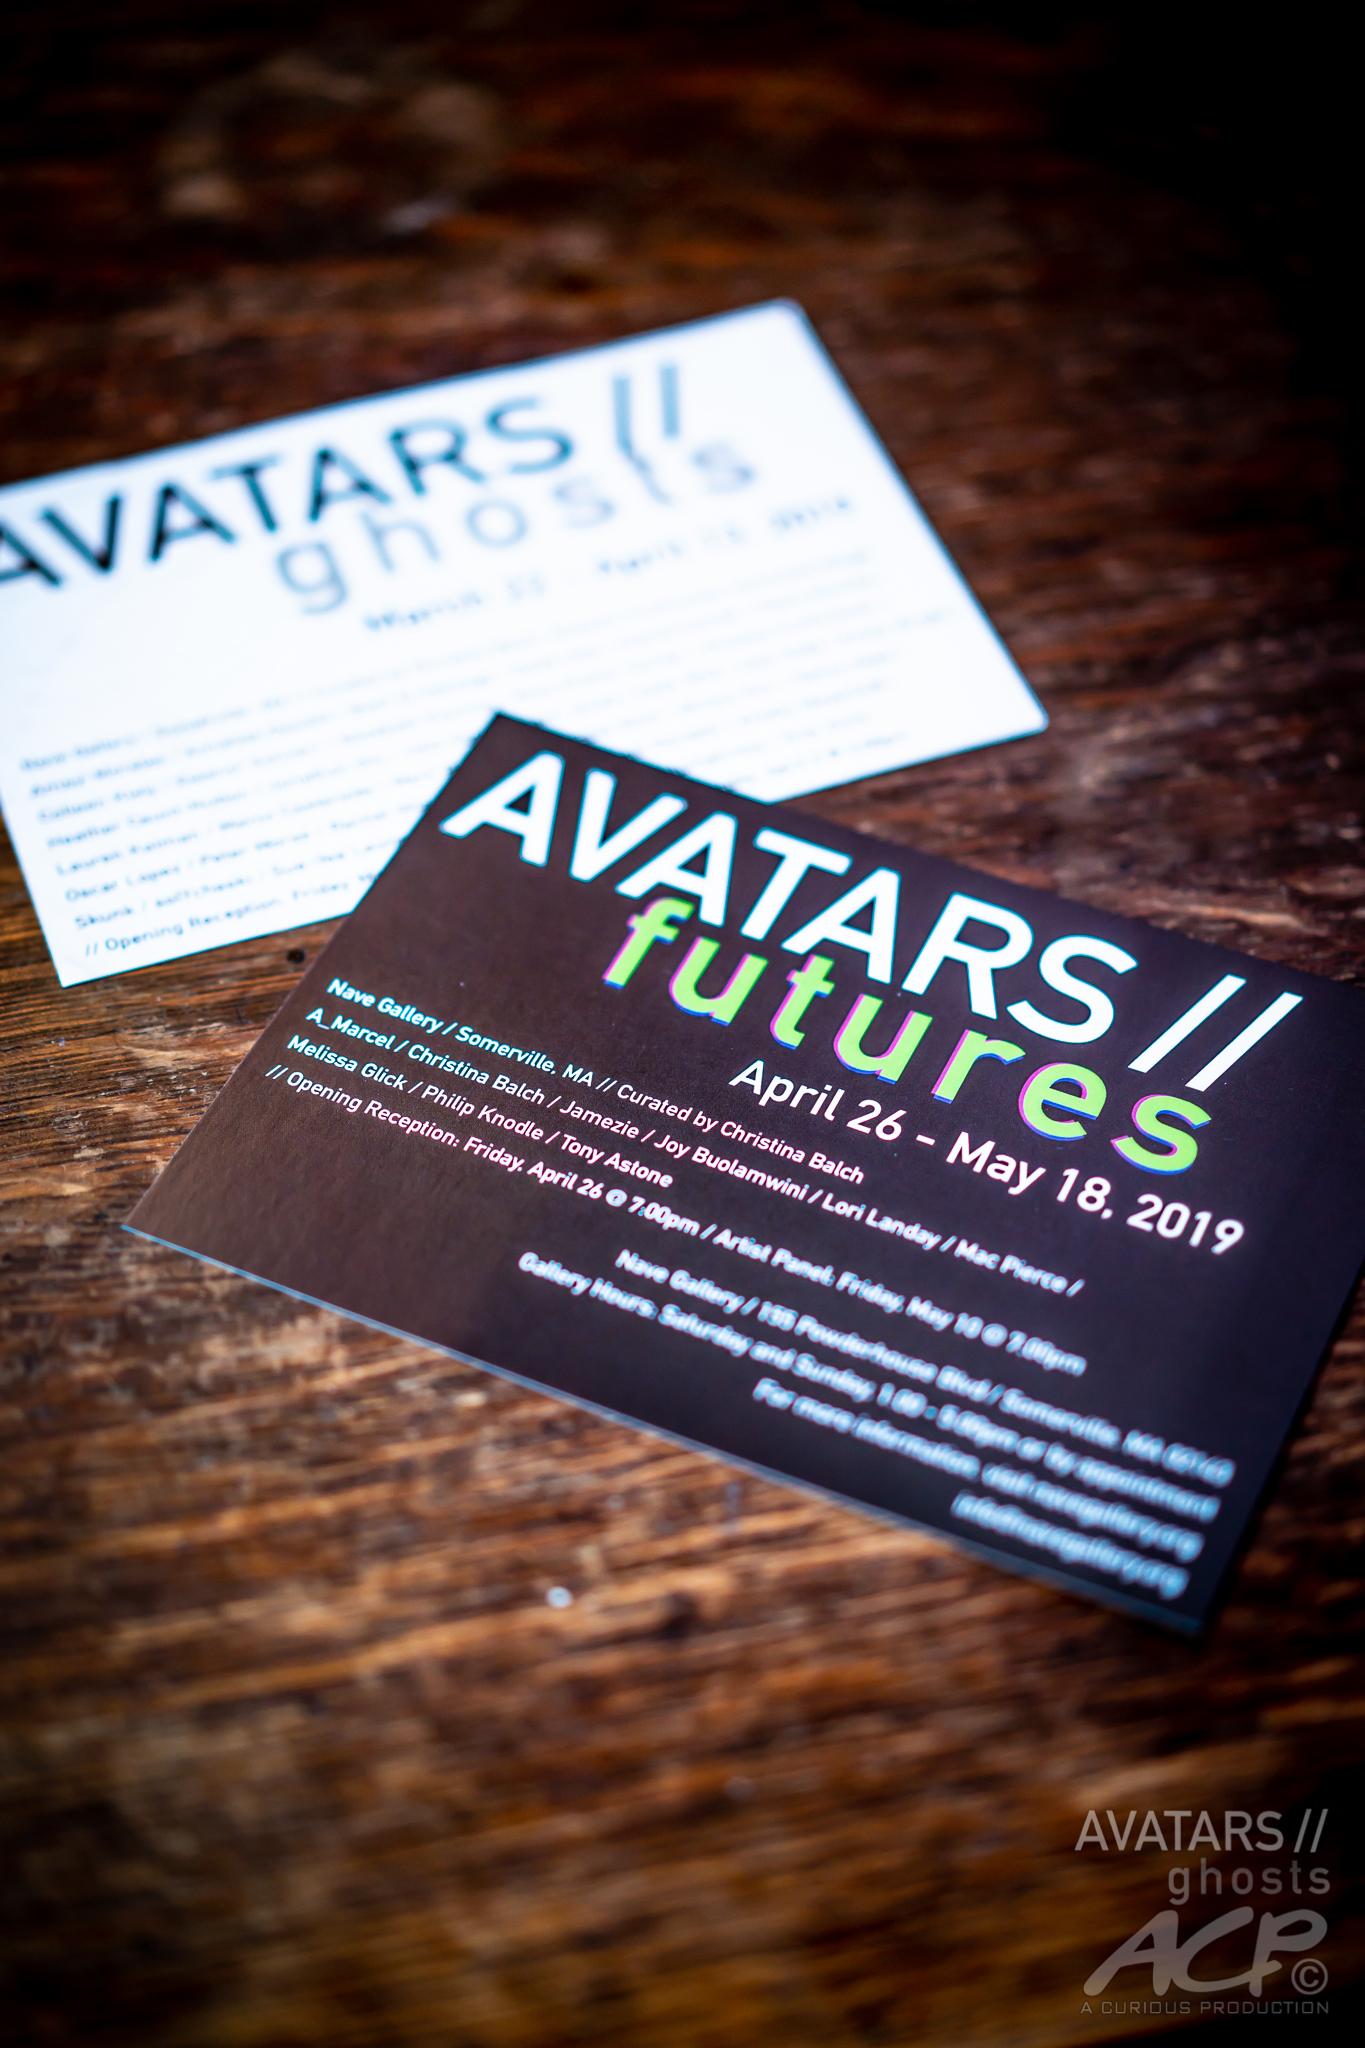 AvatarsGhosts-00883.jpg